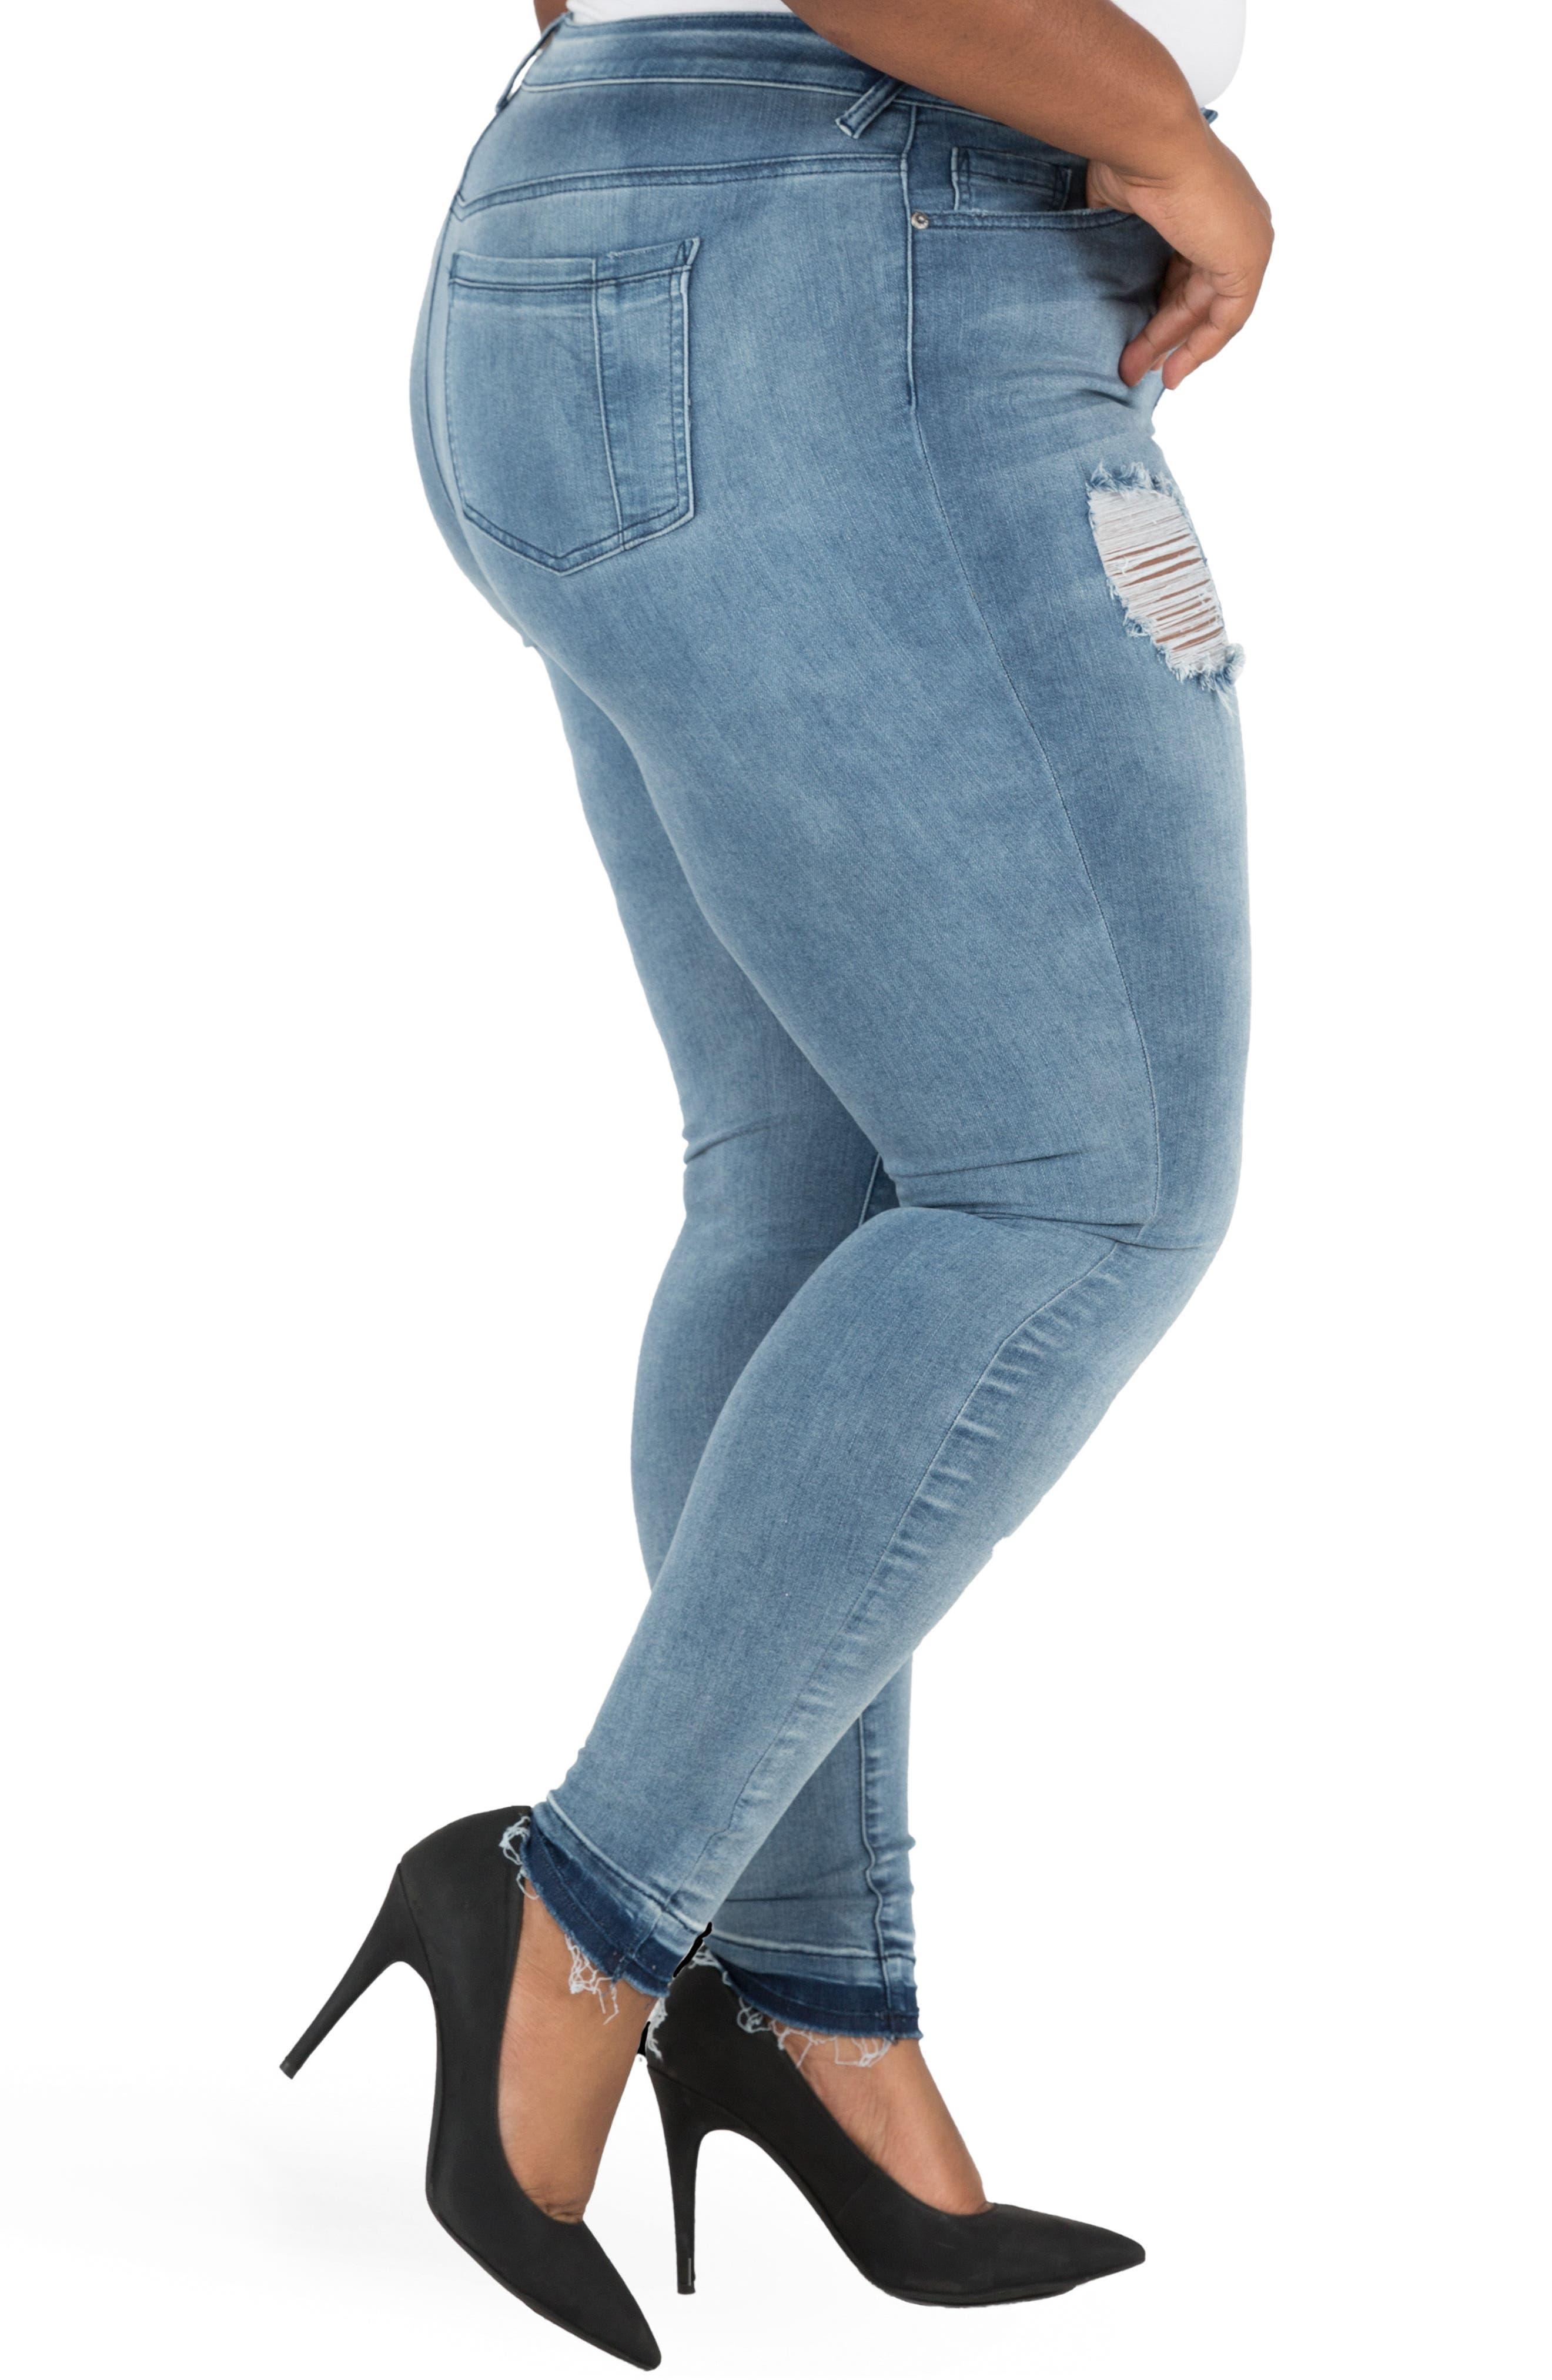 Corrine Release Hem Skinny Crop Jeans,                             Alternate thumbnail 3, color,                             LIGHT BLUE